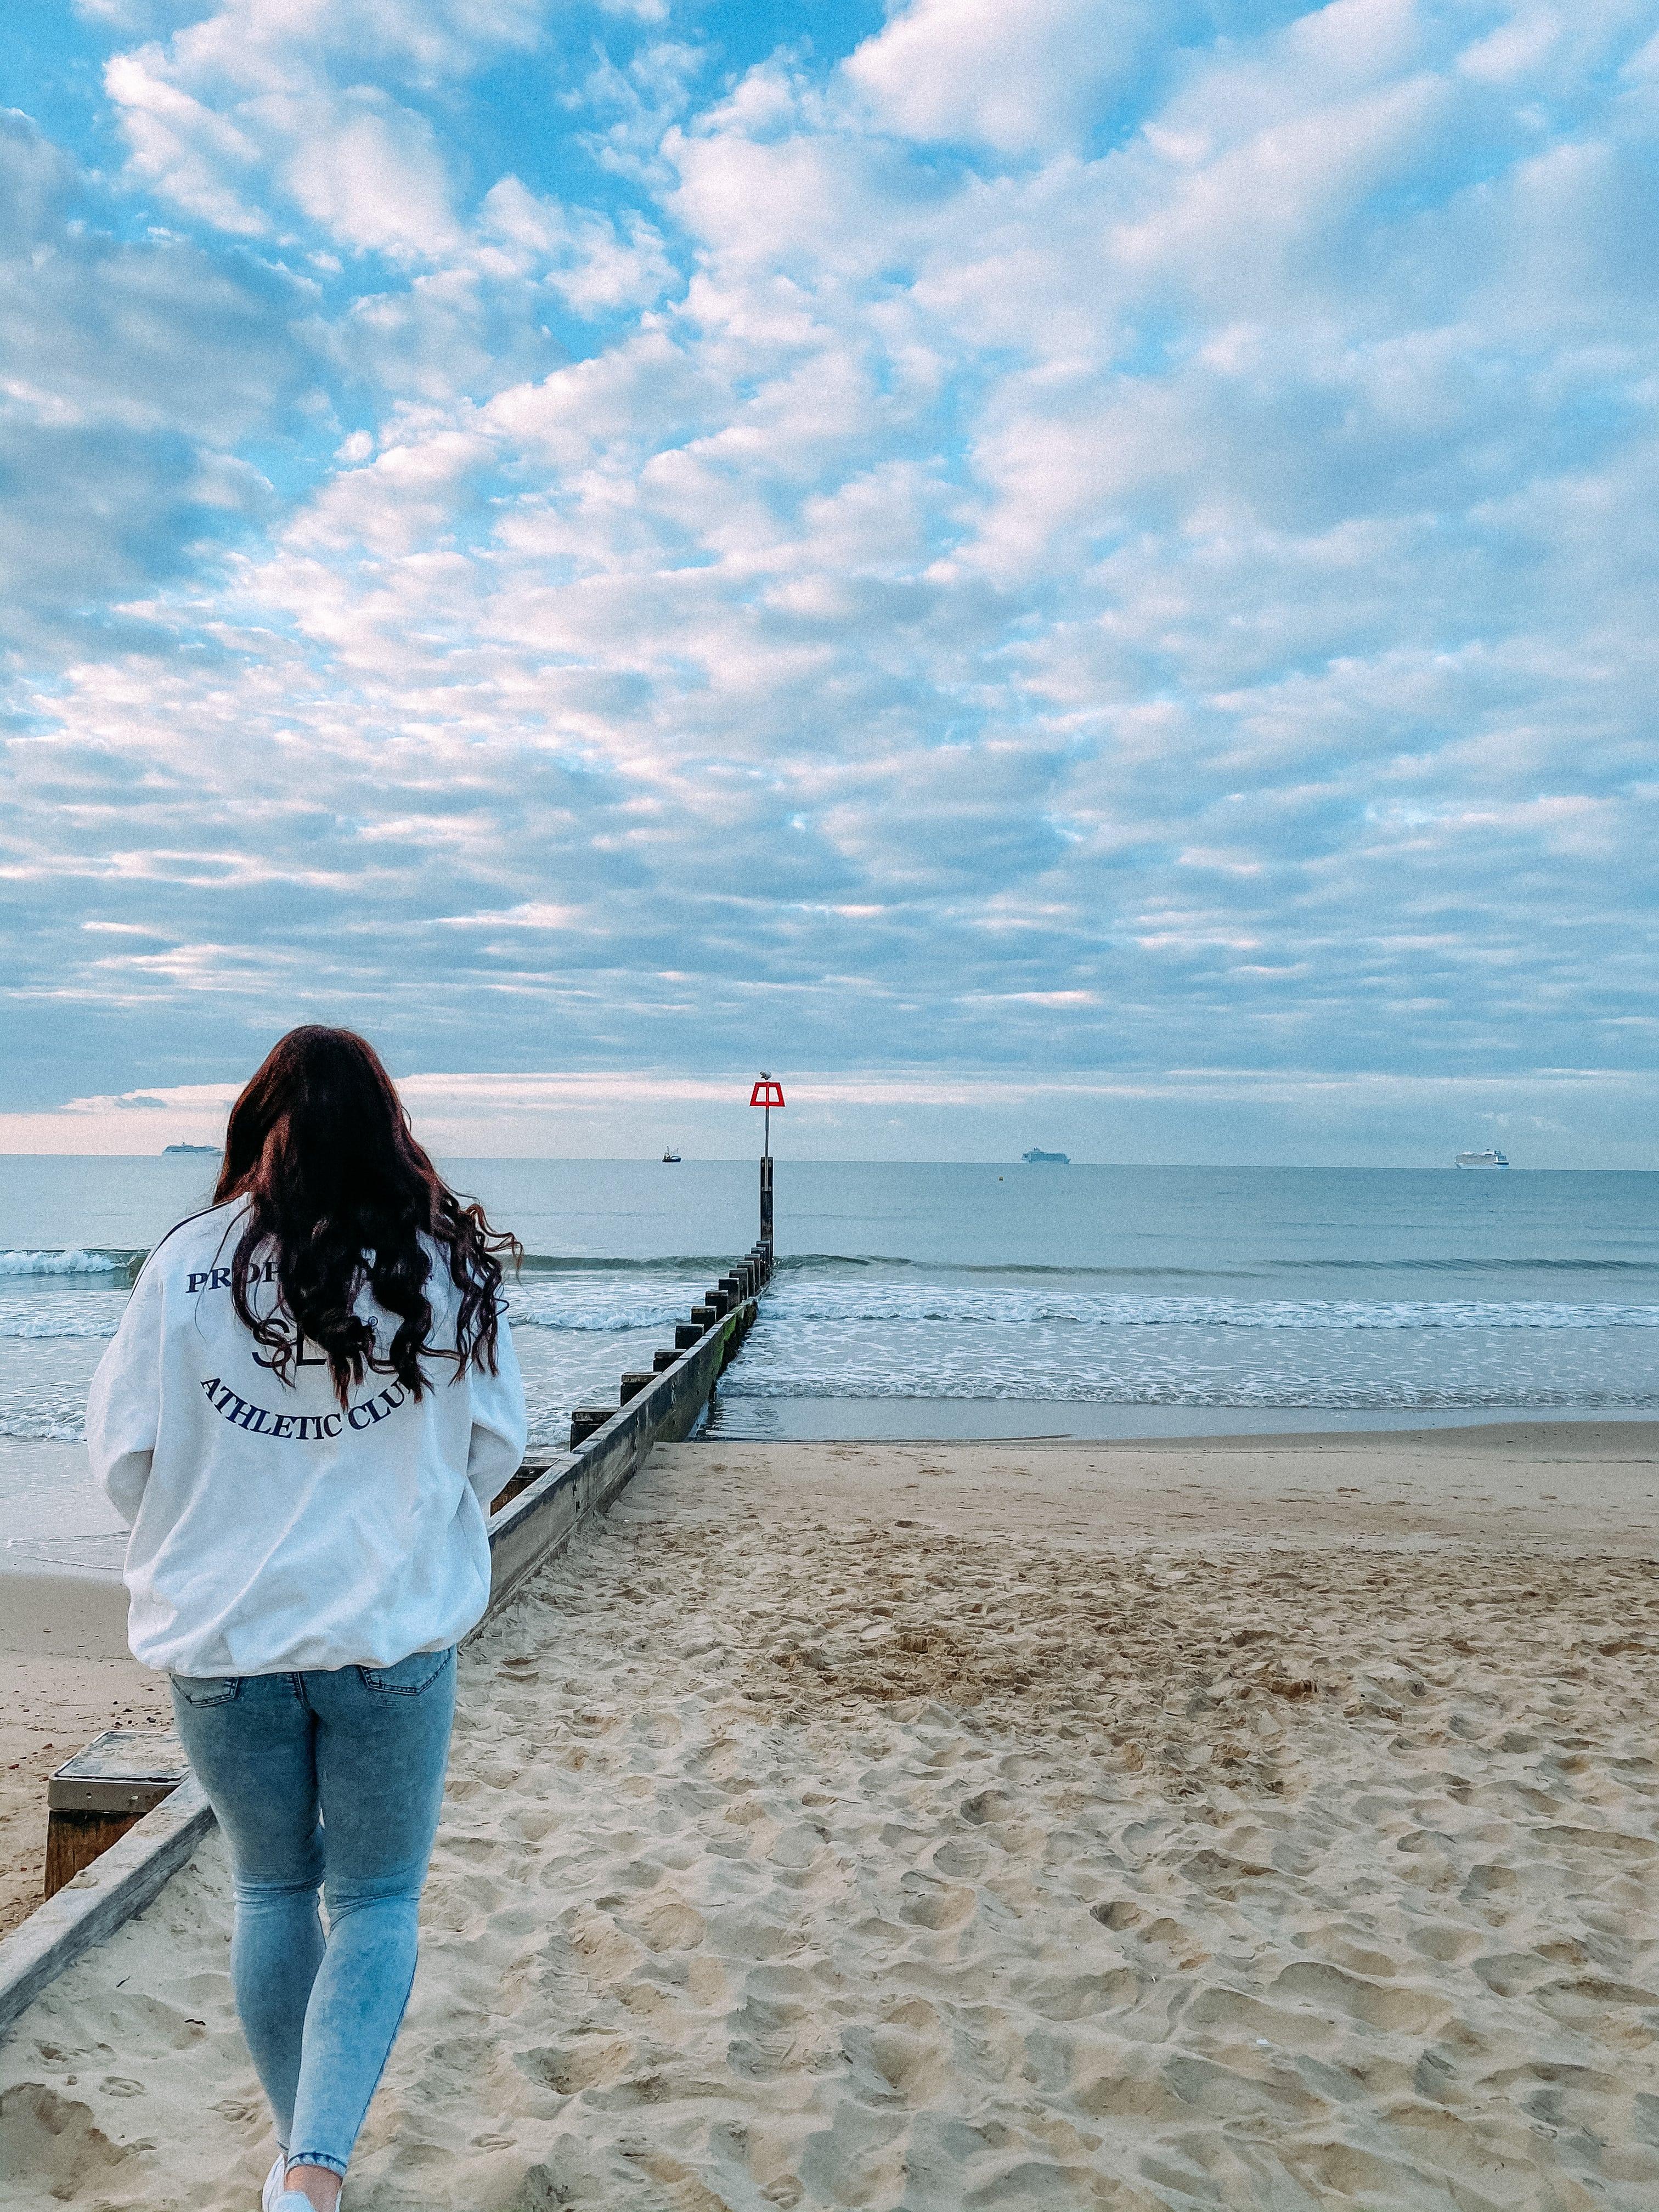 sunrise at bournemouth beach UK